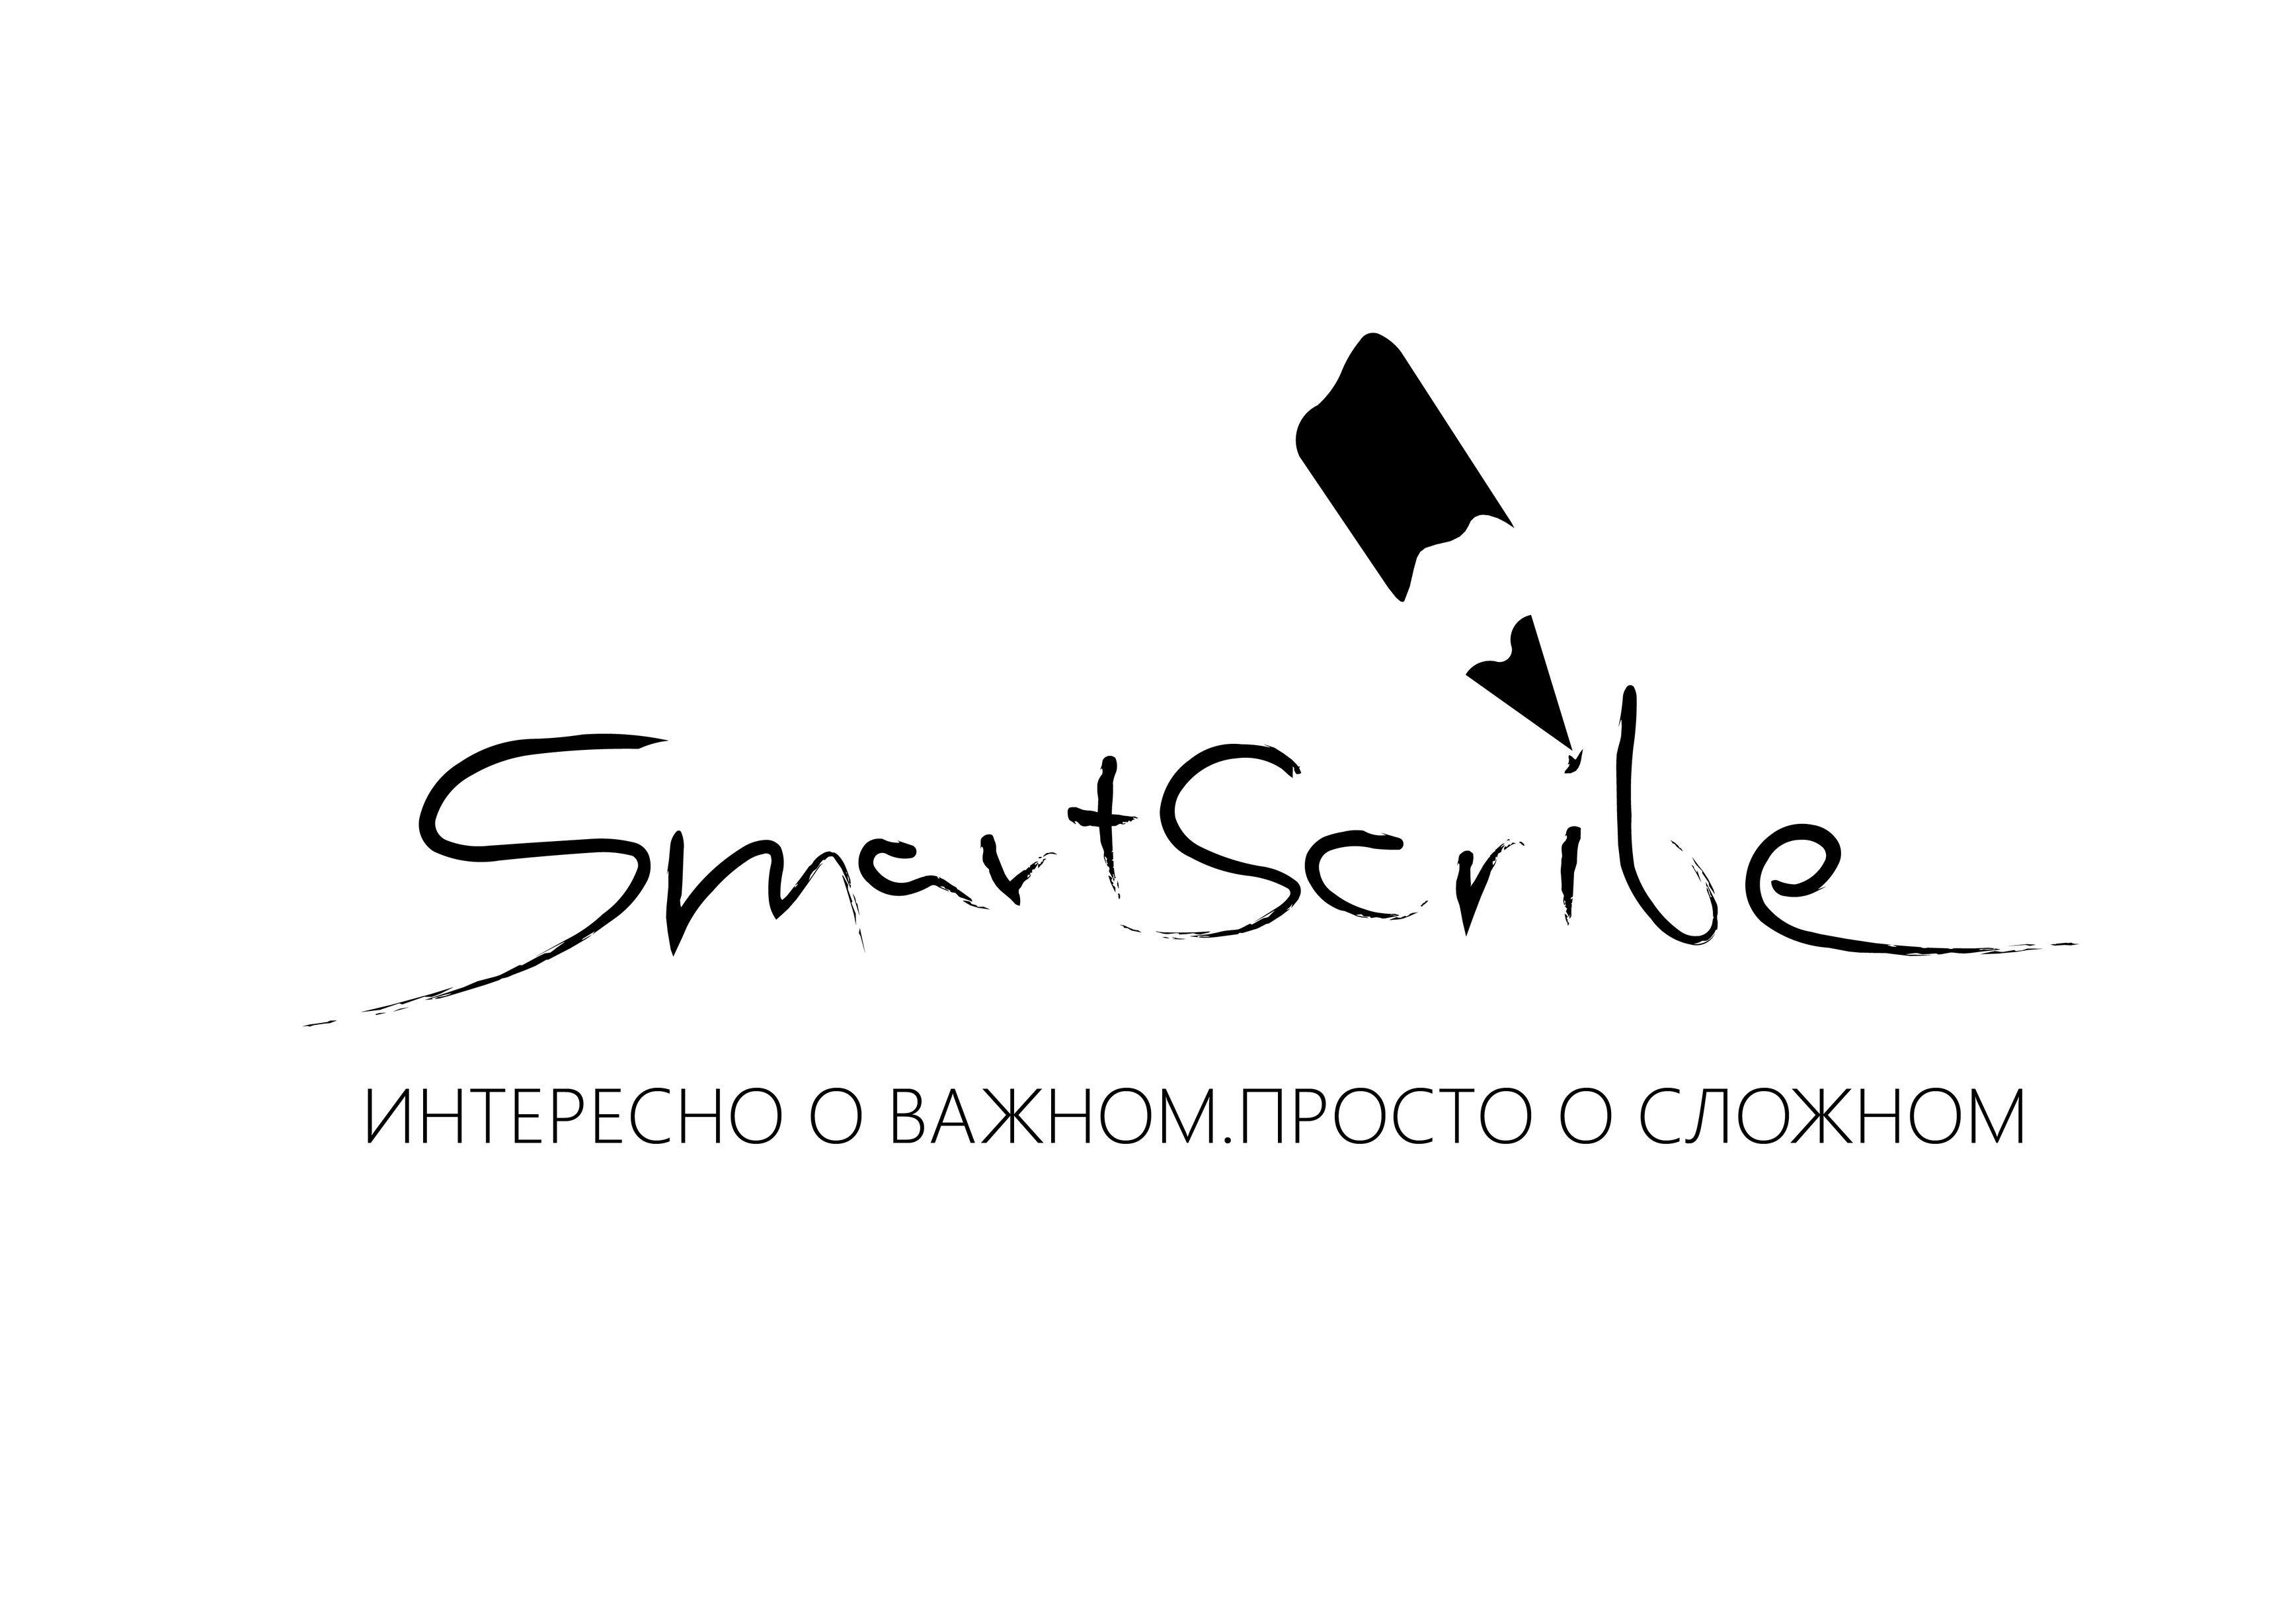 Лого, визитка и шаблон презентации для SmartScribe - дизайнер kirilln84